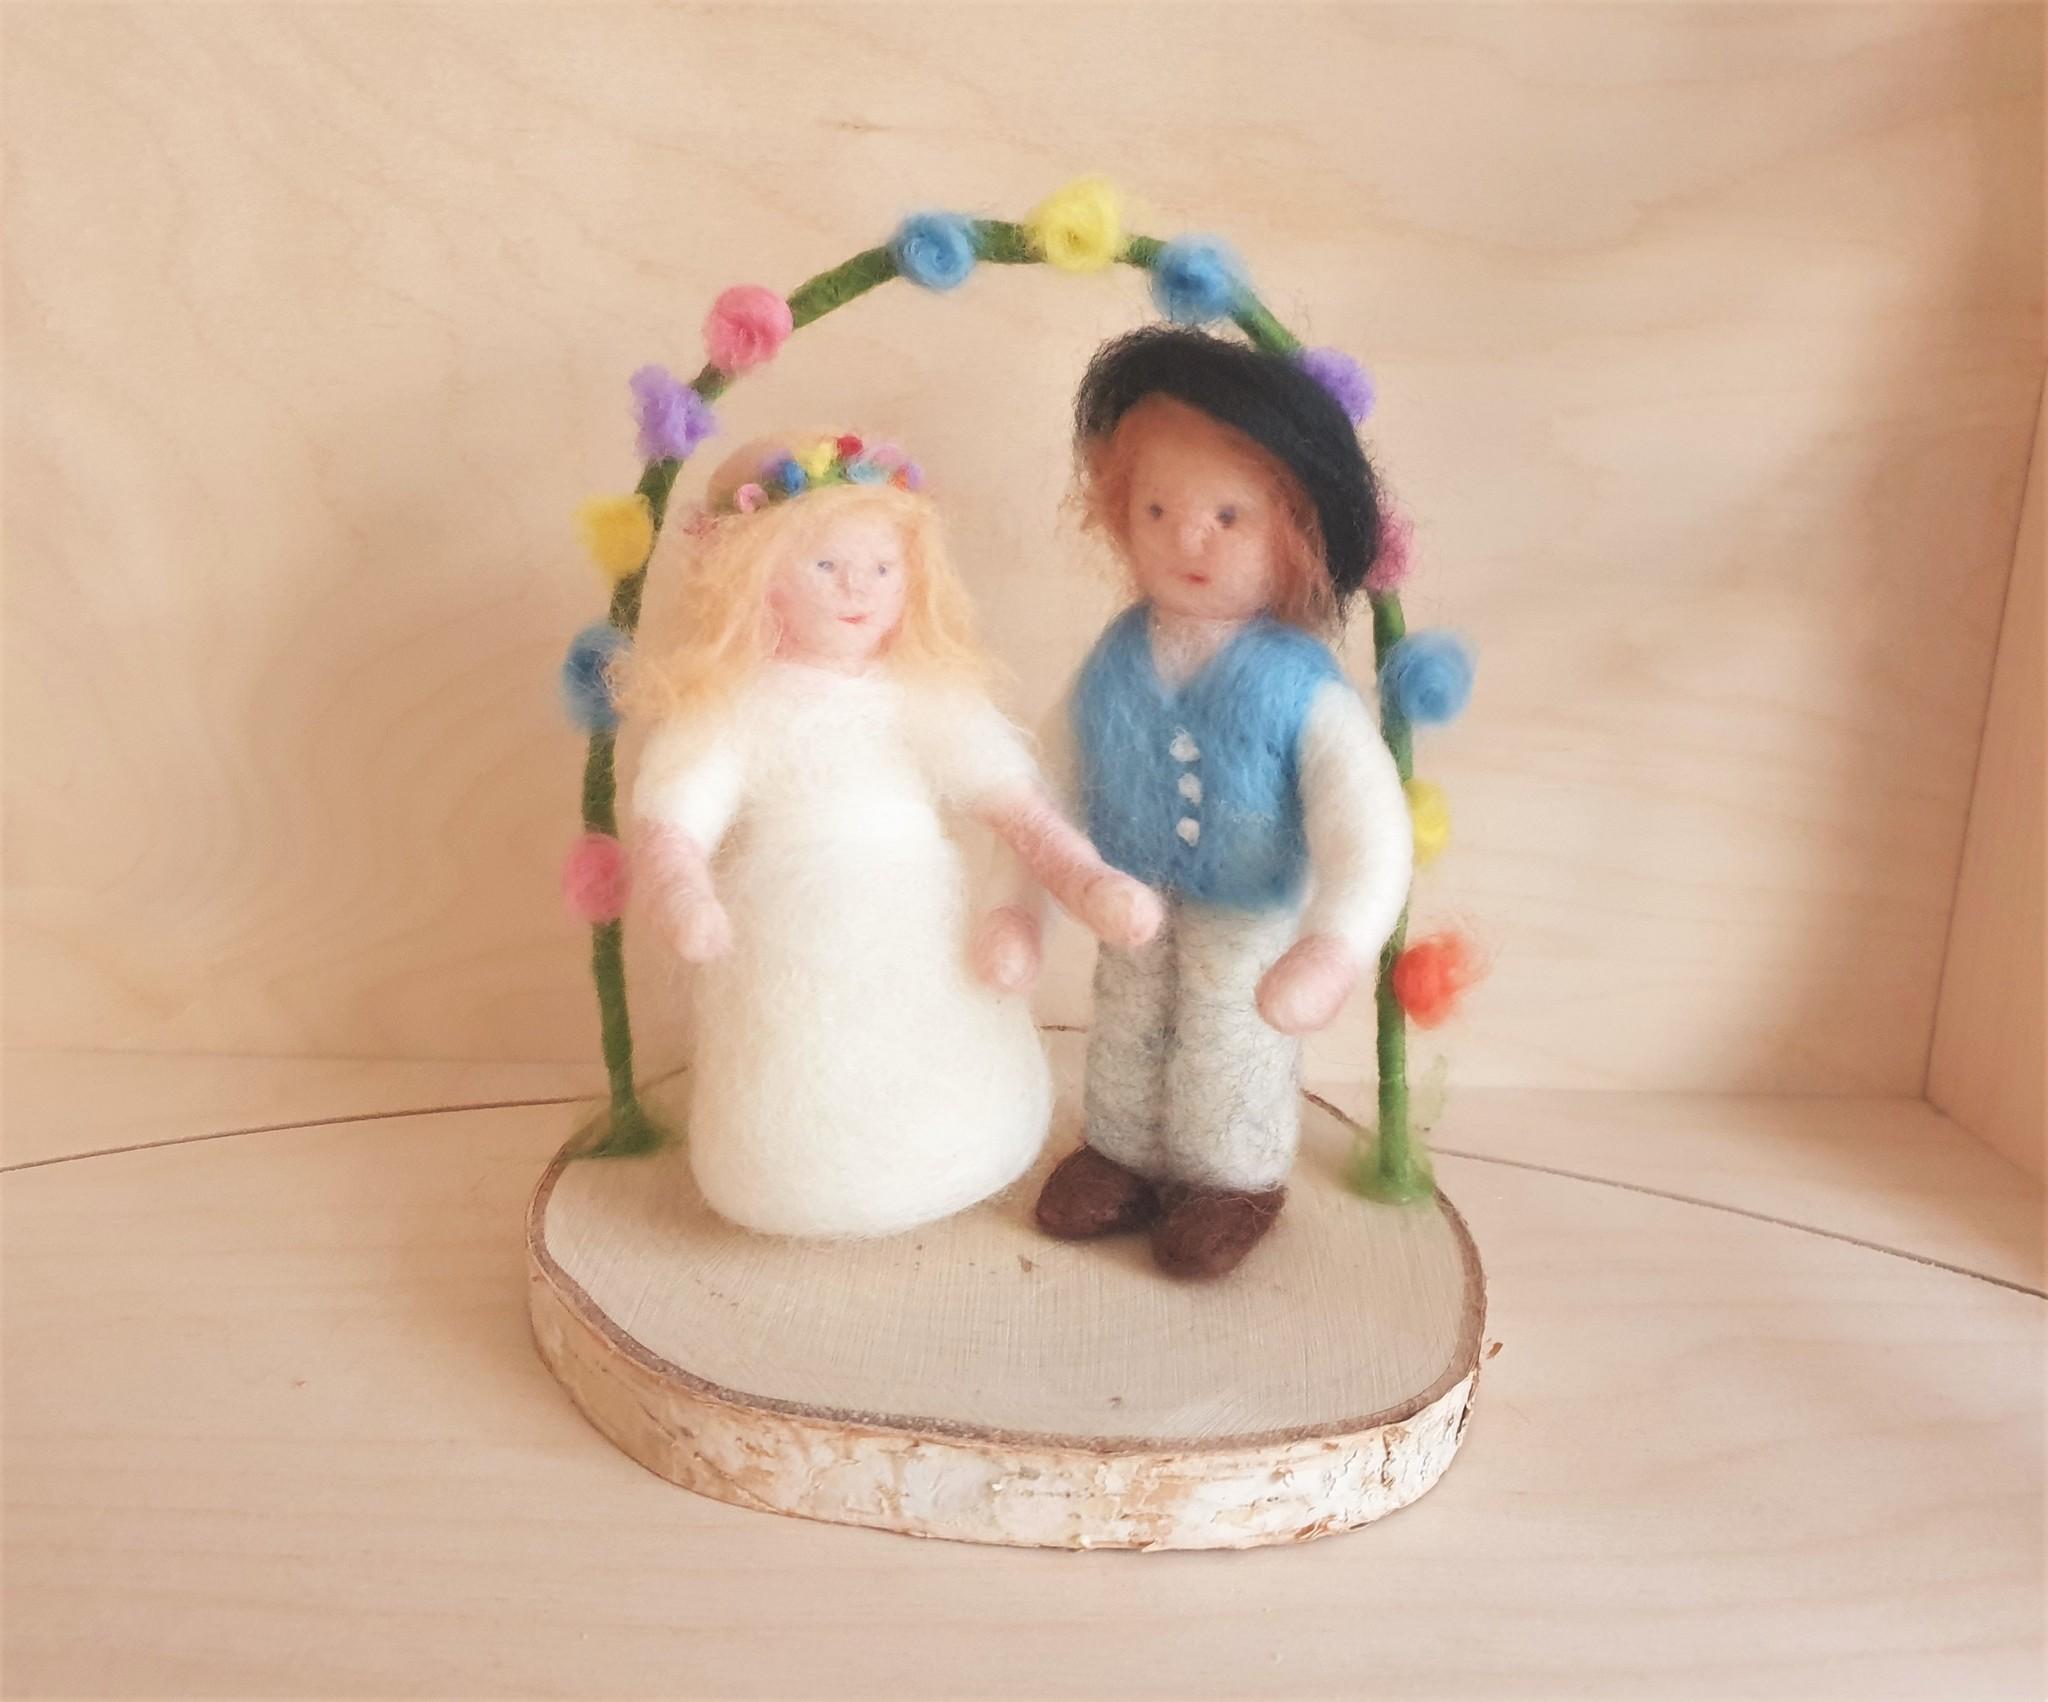 De Wolshoop Pinksterbruid & bruidegom